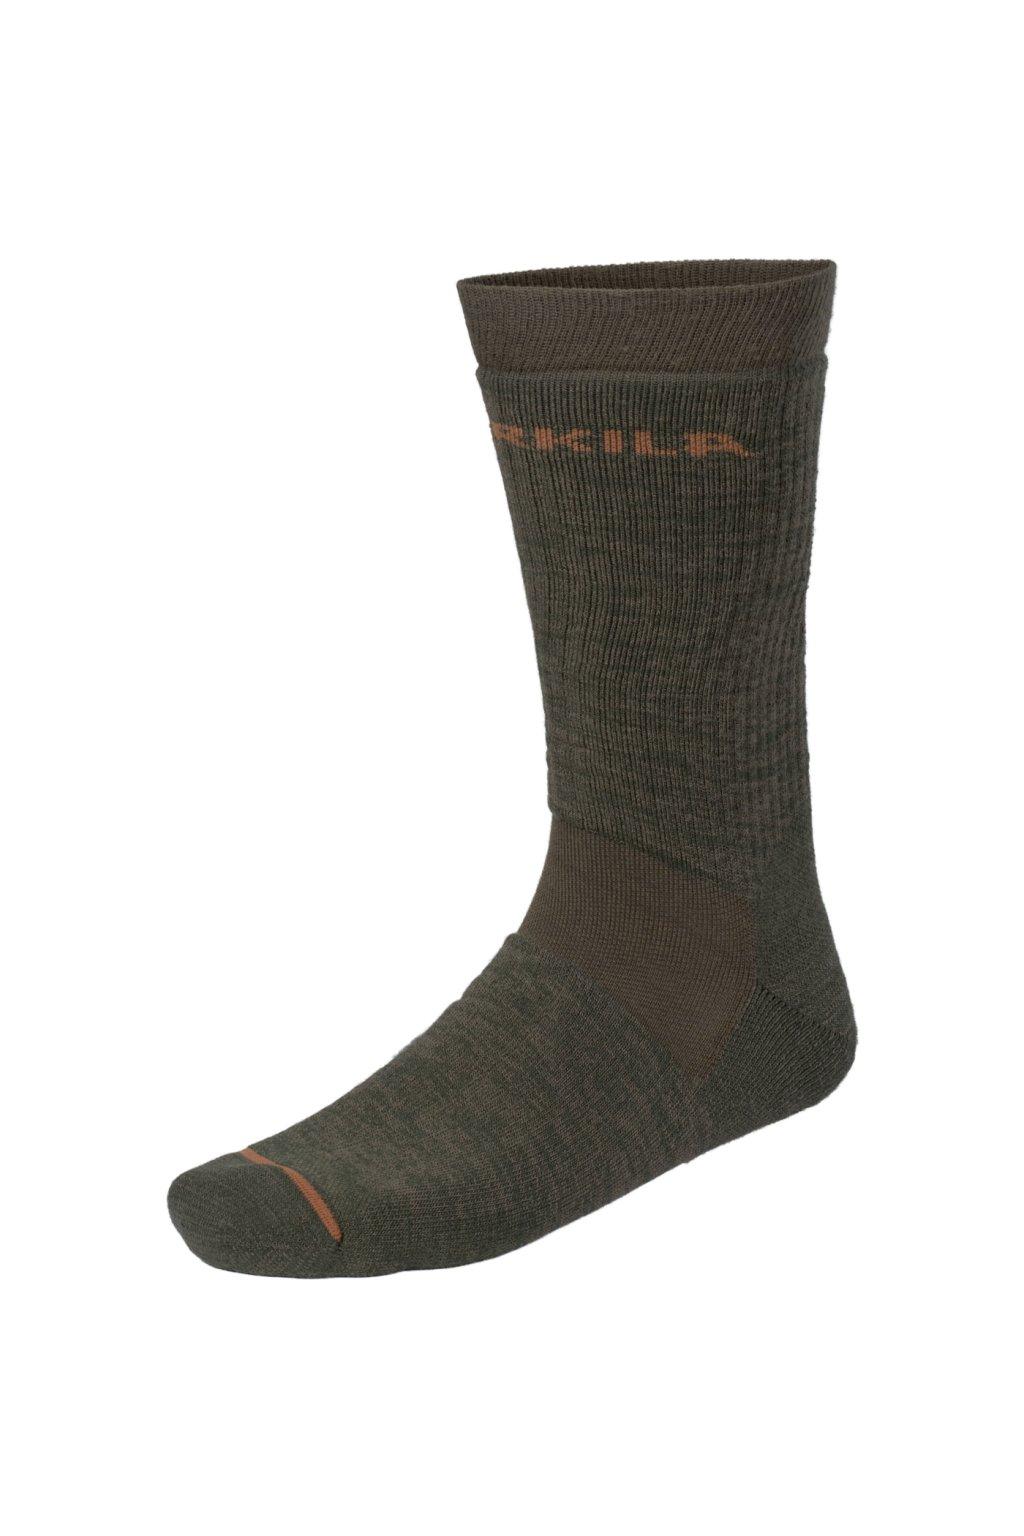 HÄRKILA - Pro Hunter II. ponožky krátké (willow green/shadow brown)